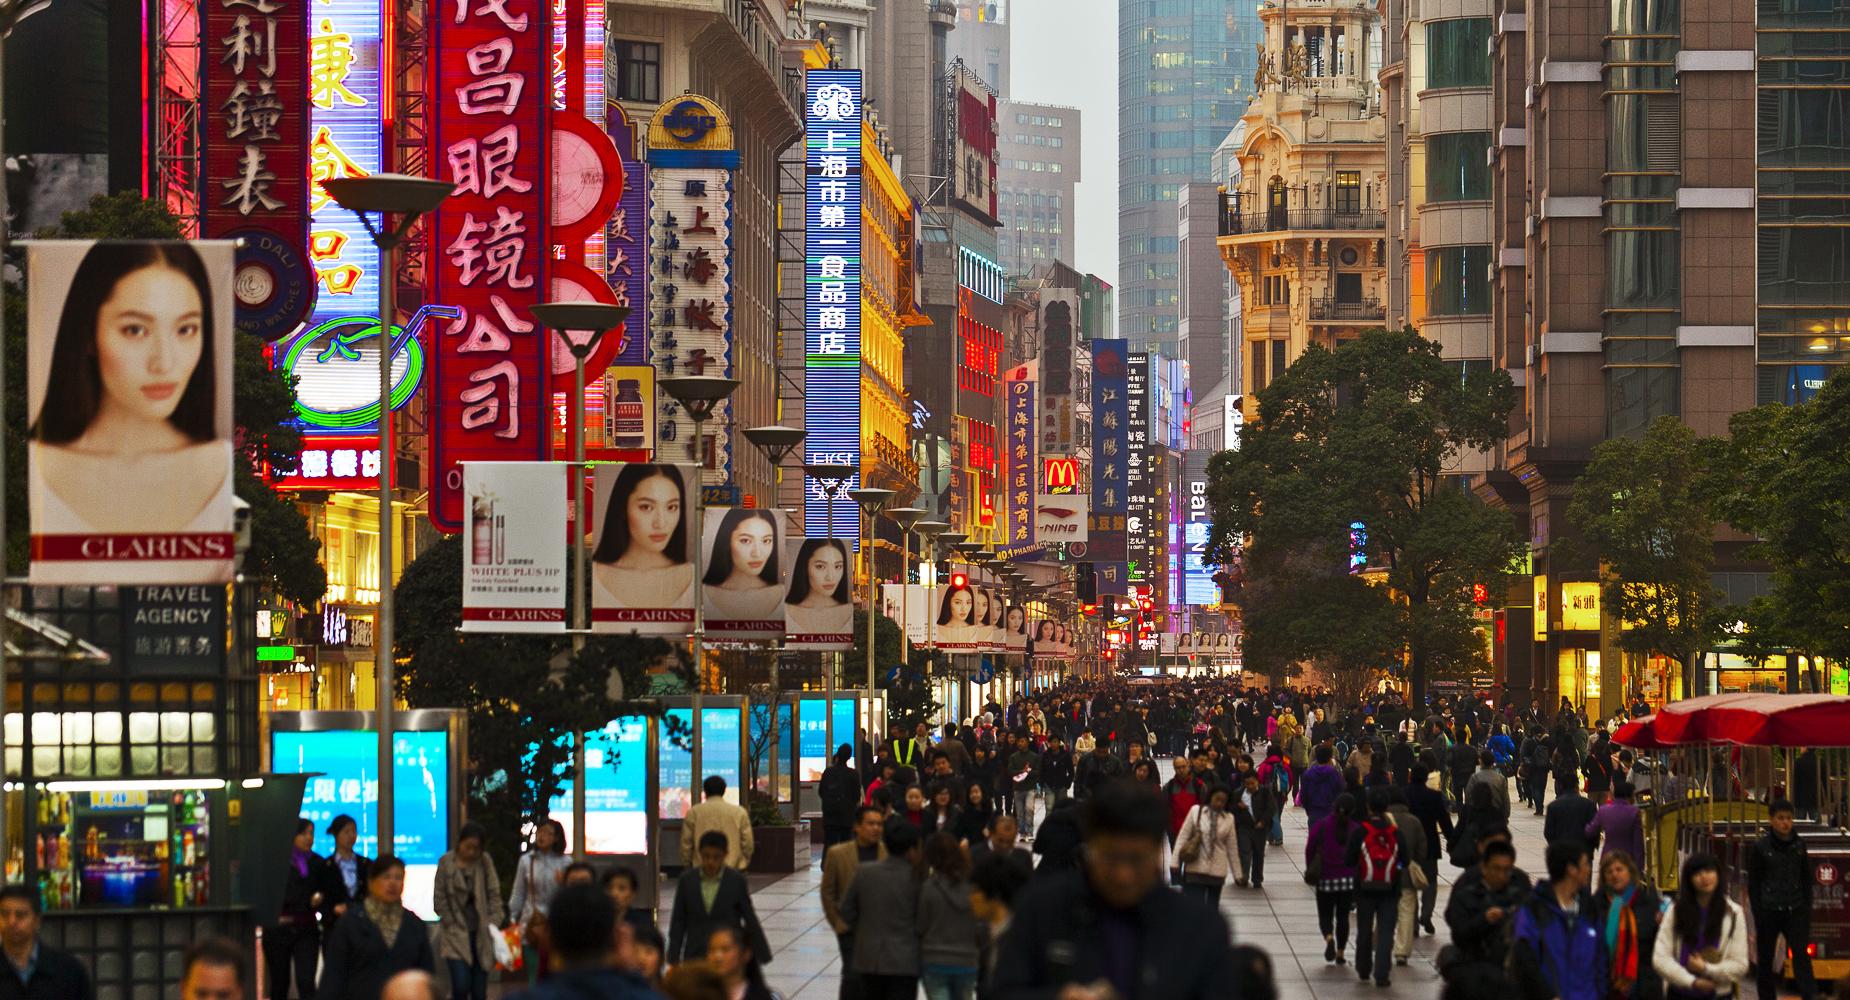 Улица в Шанхае. Фото: wikimedia.org